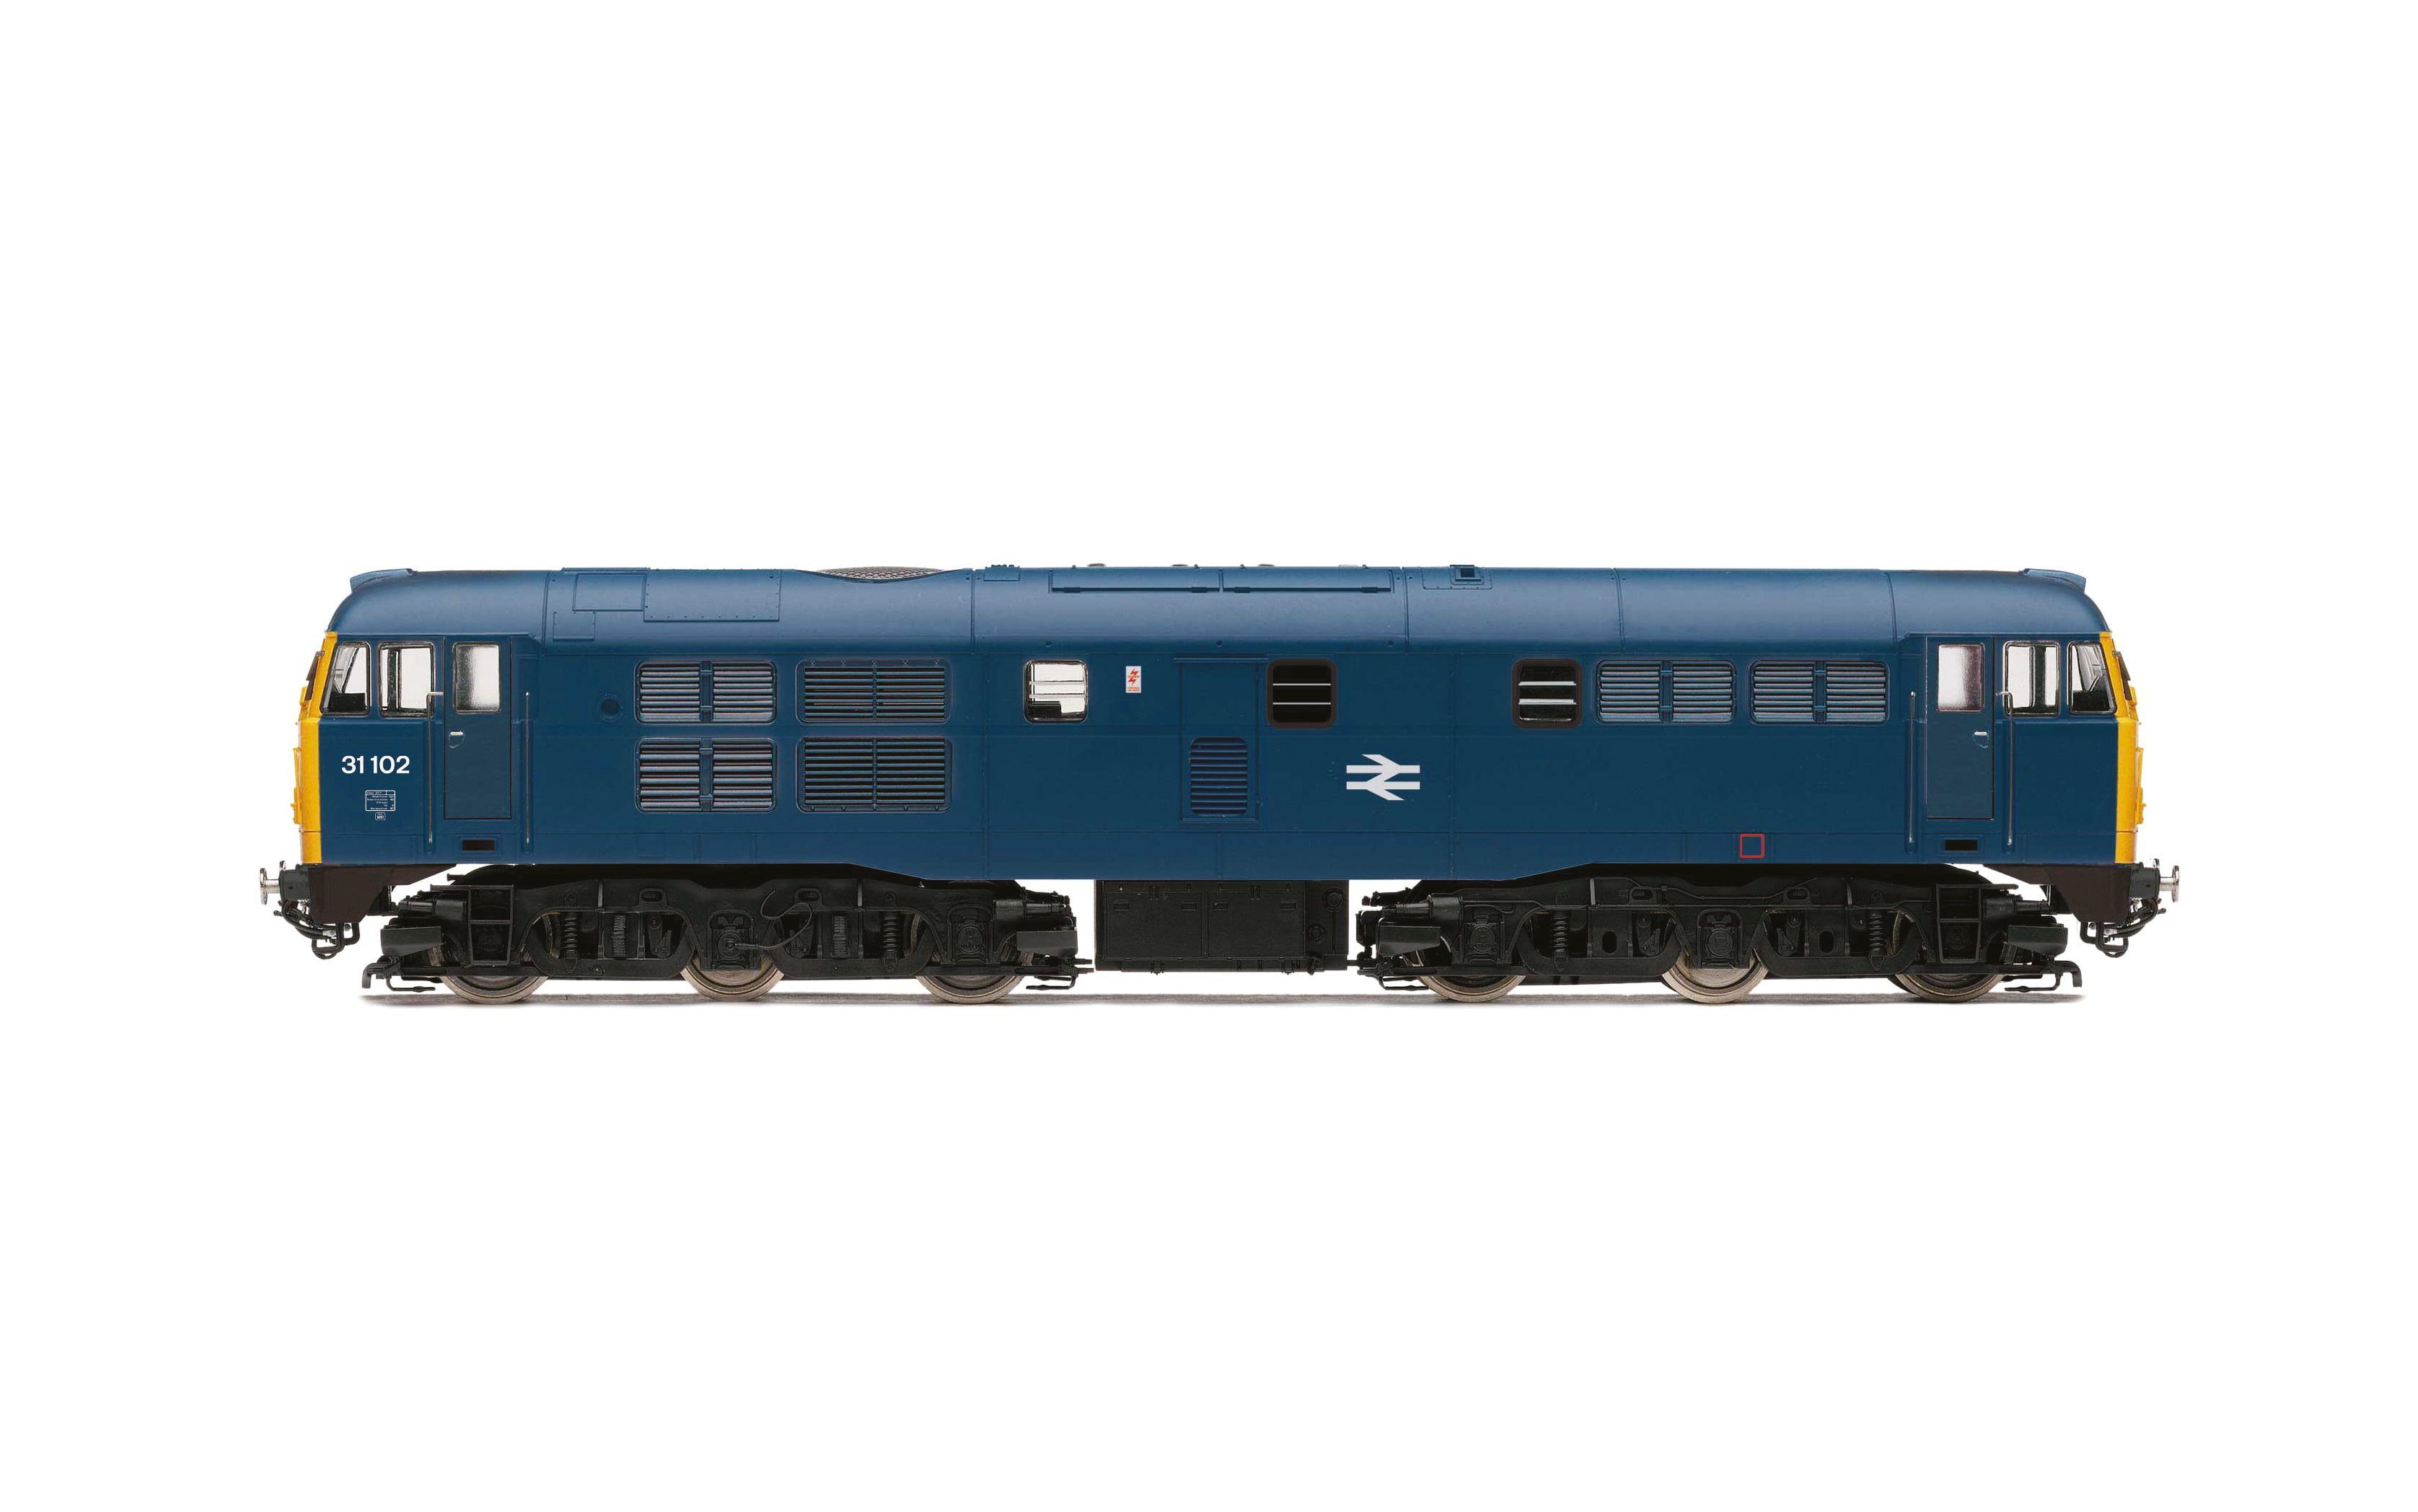 BR, Class 31, A1A-A1A, 31102 - Era 7